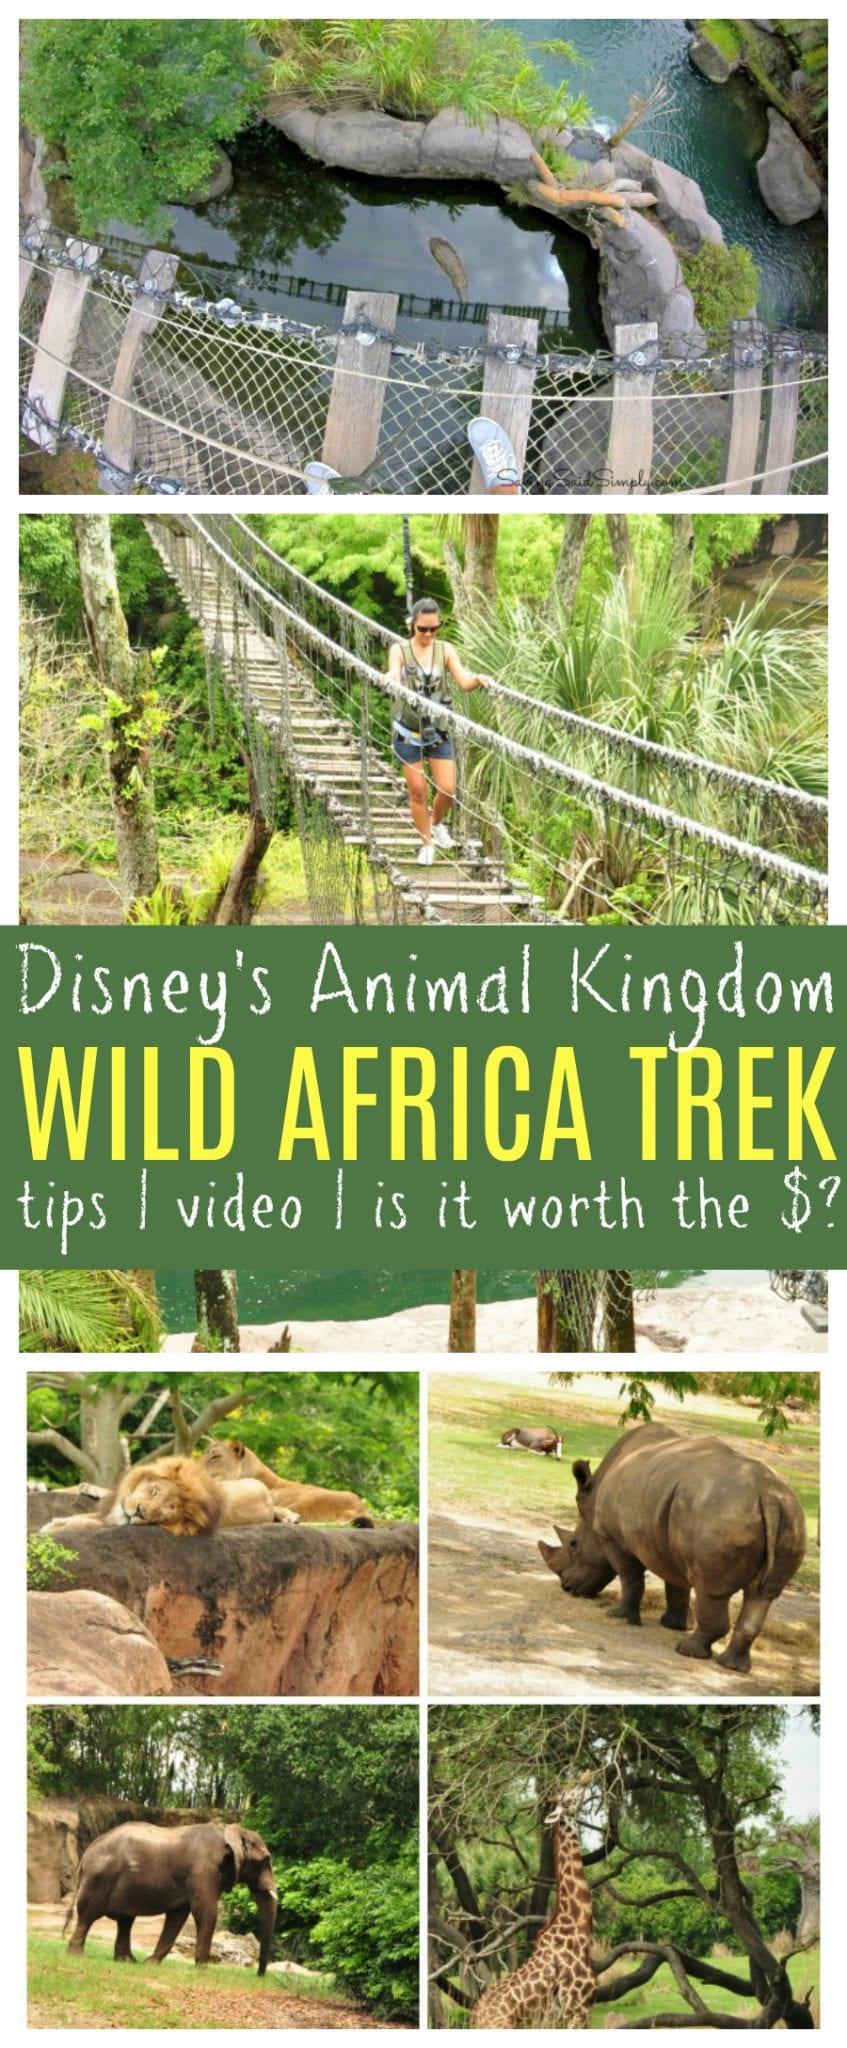 Disney wild Africa trek review pinterest